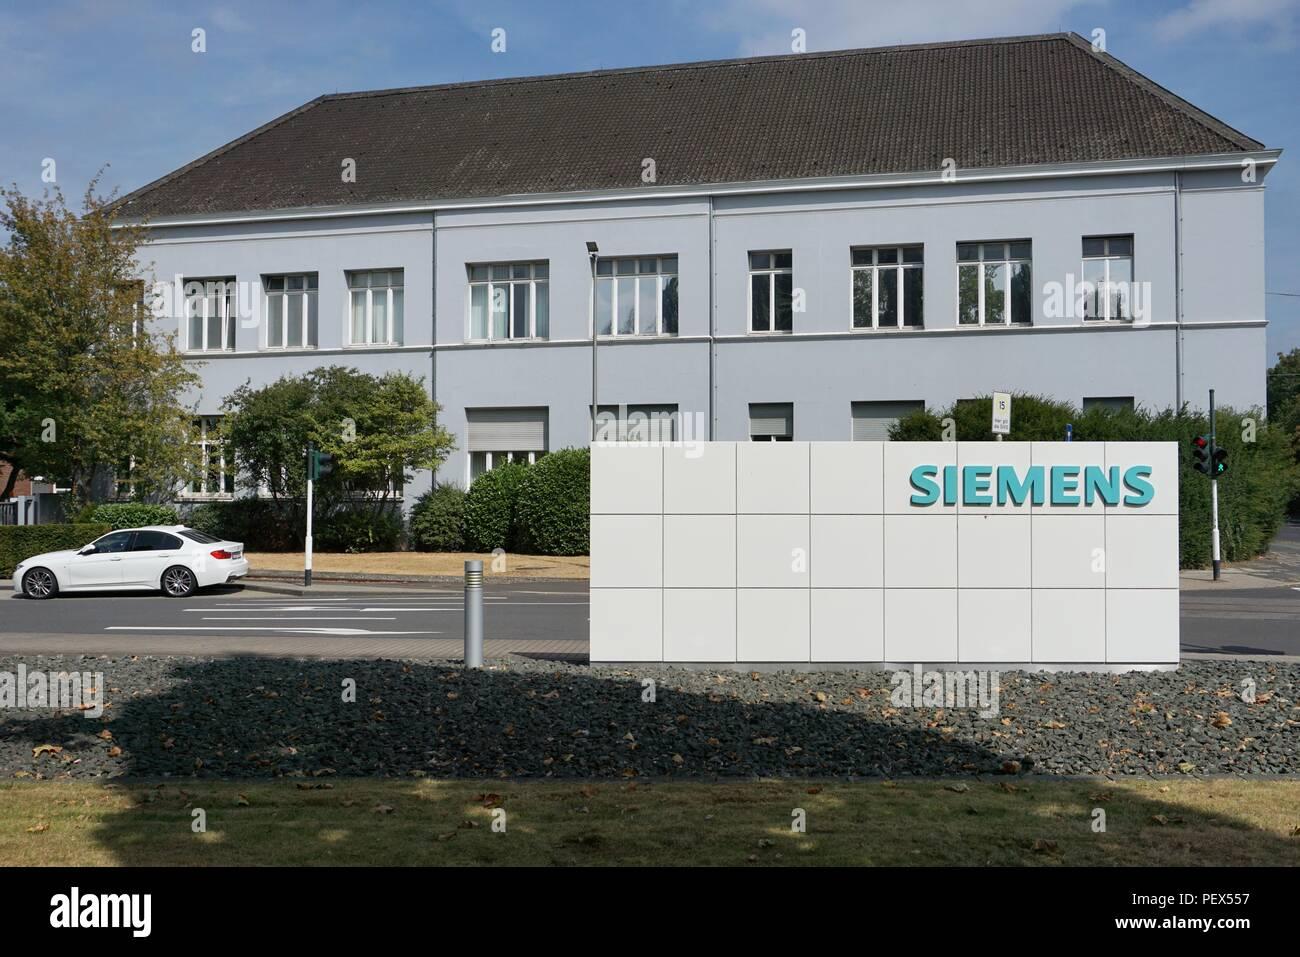 siemens train company germany - Stock Image